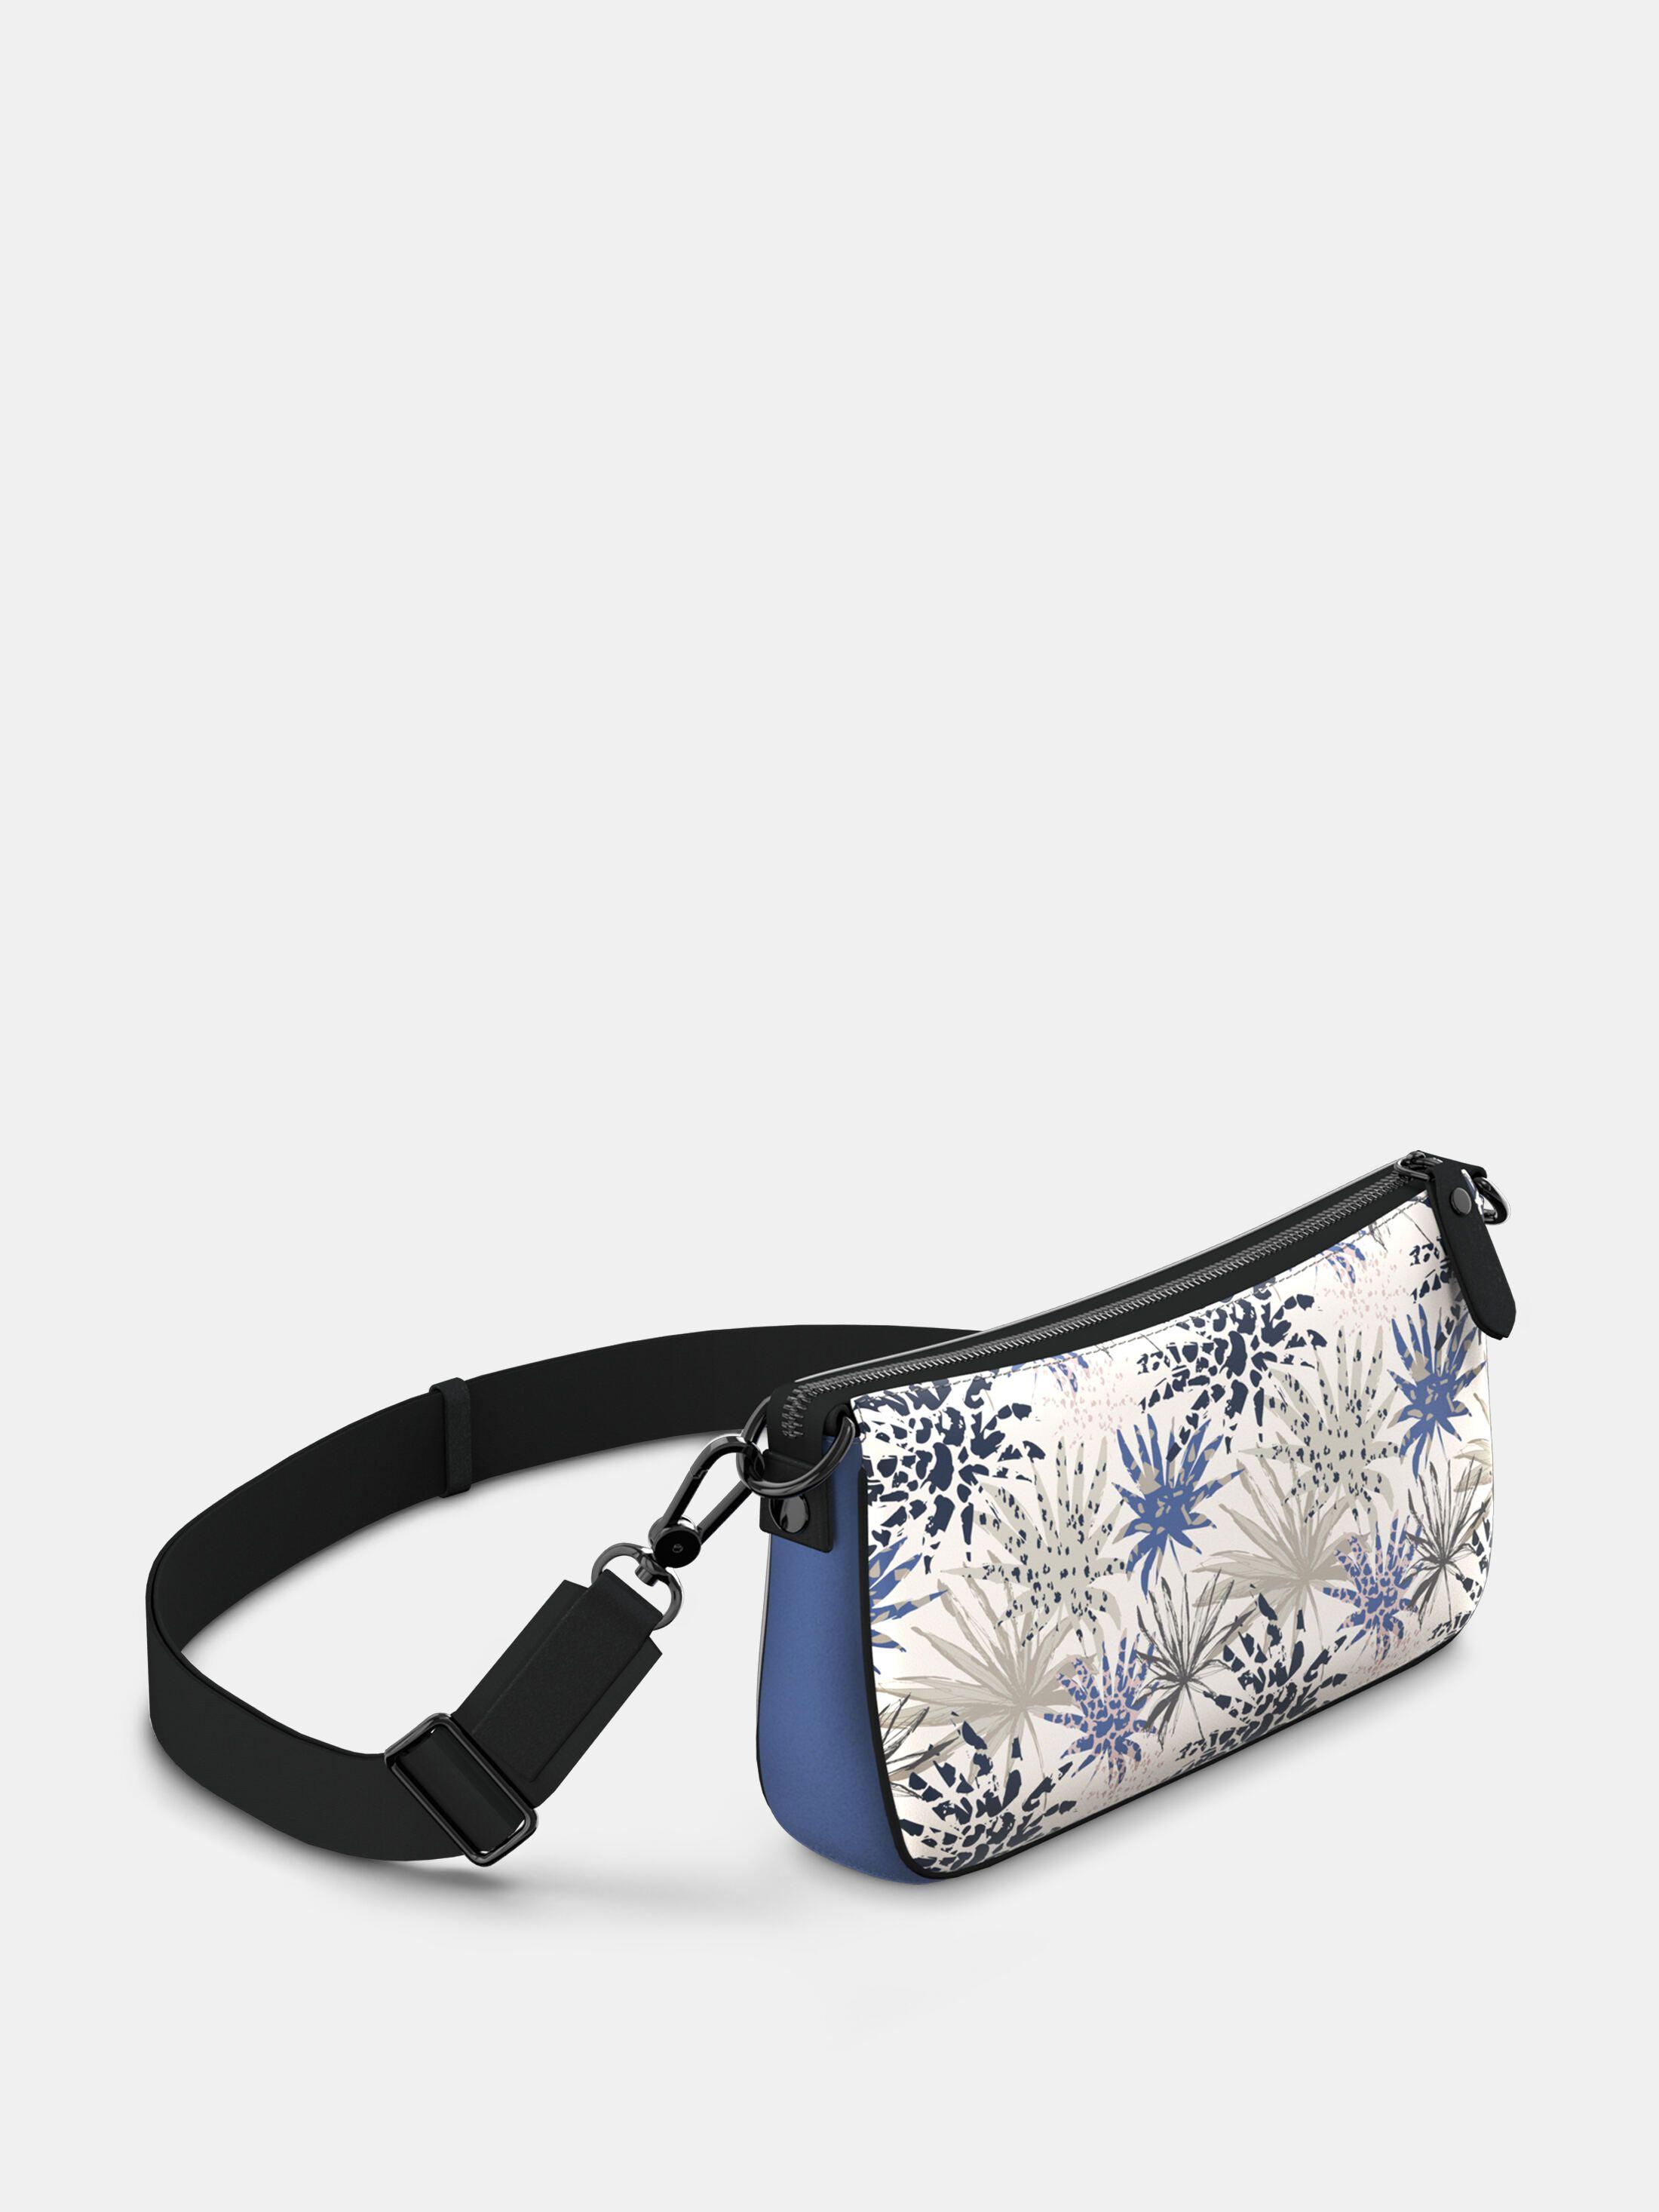 long strap baguette bag